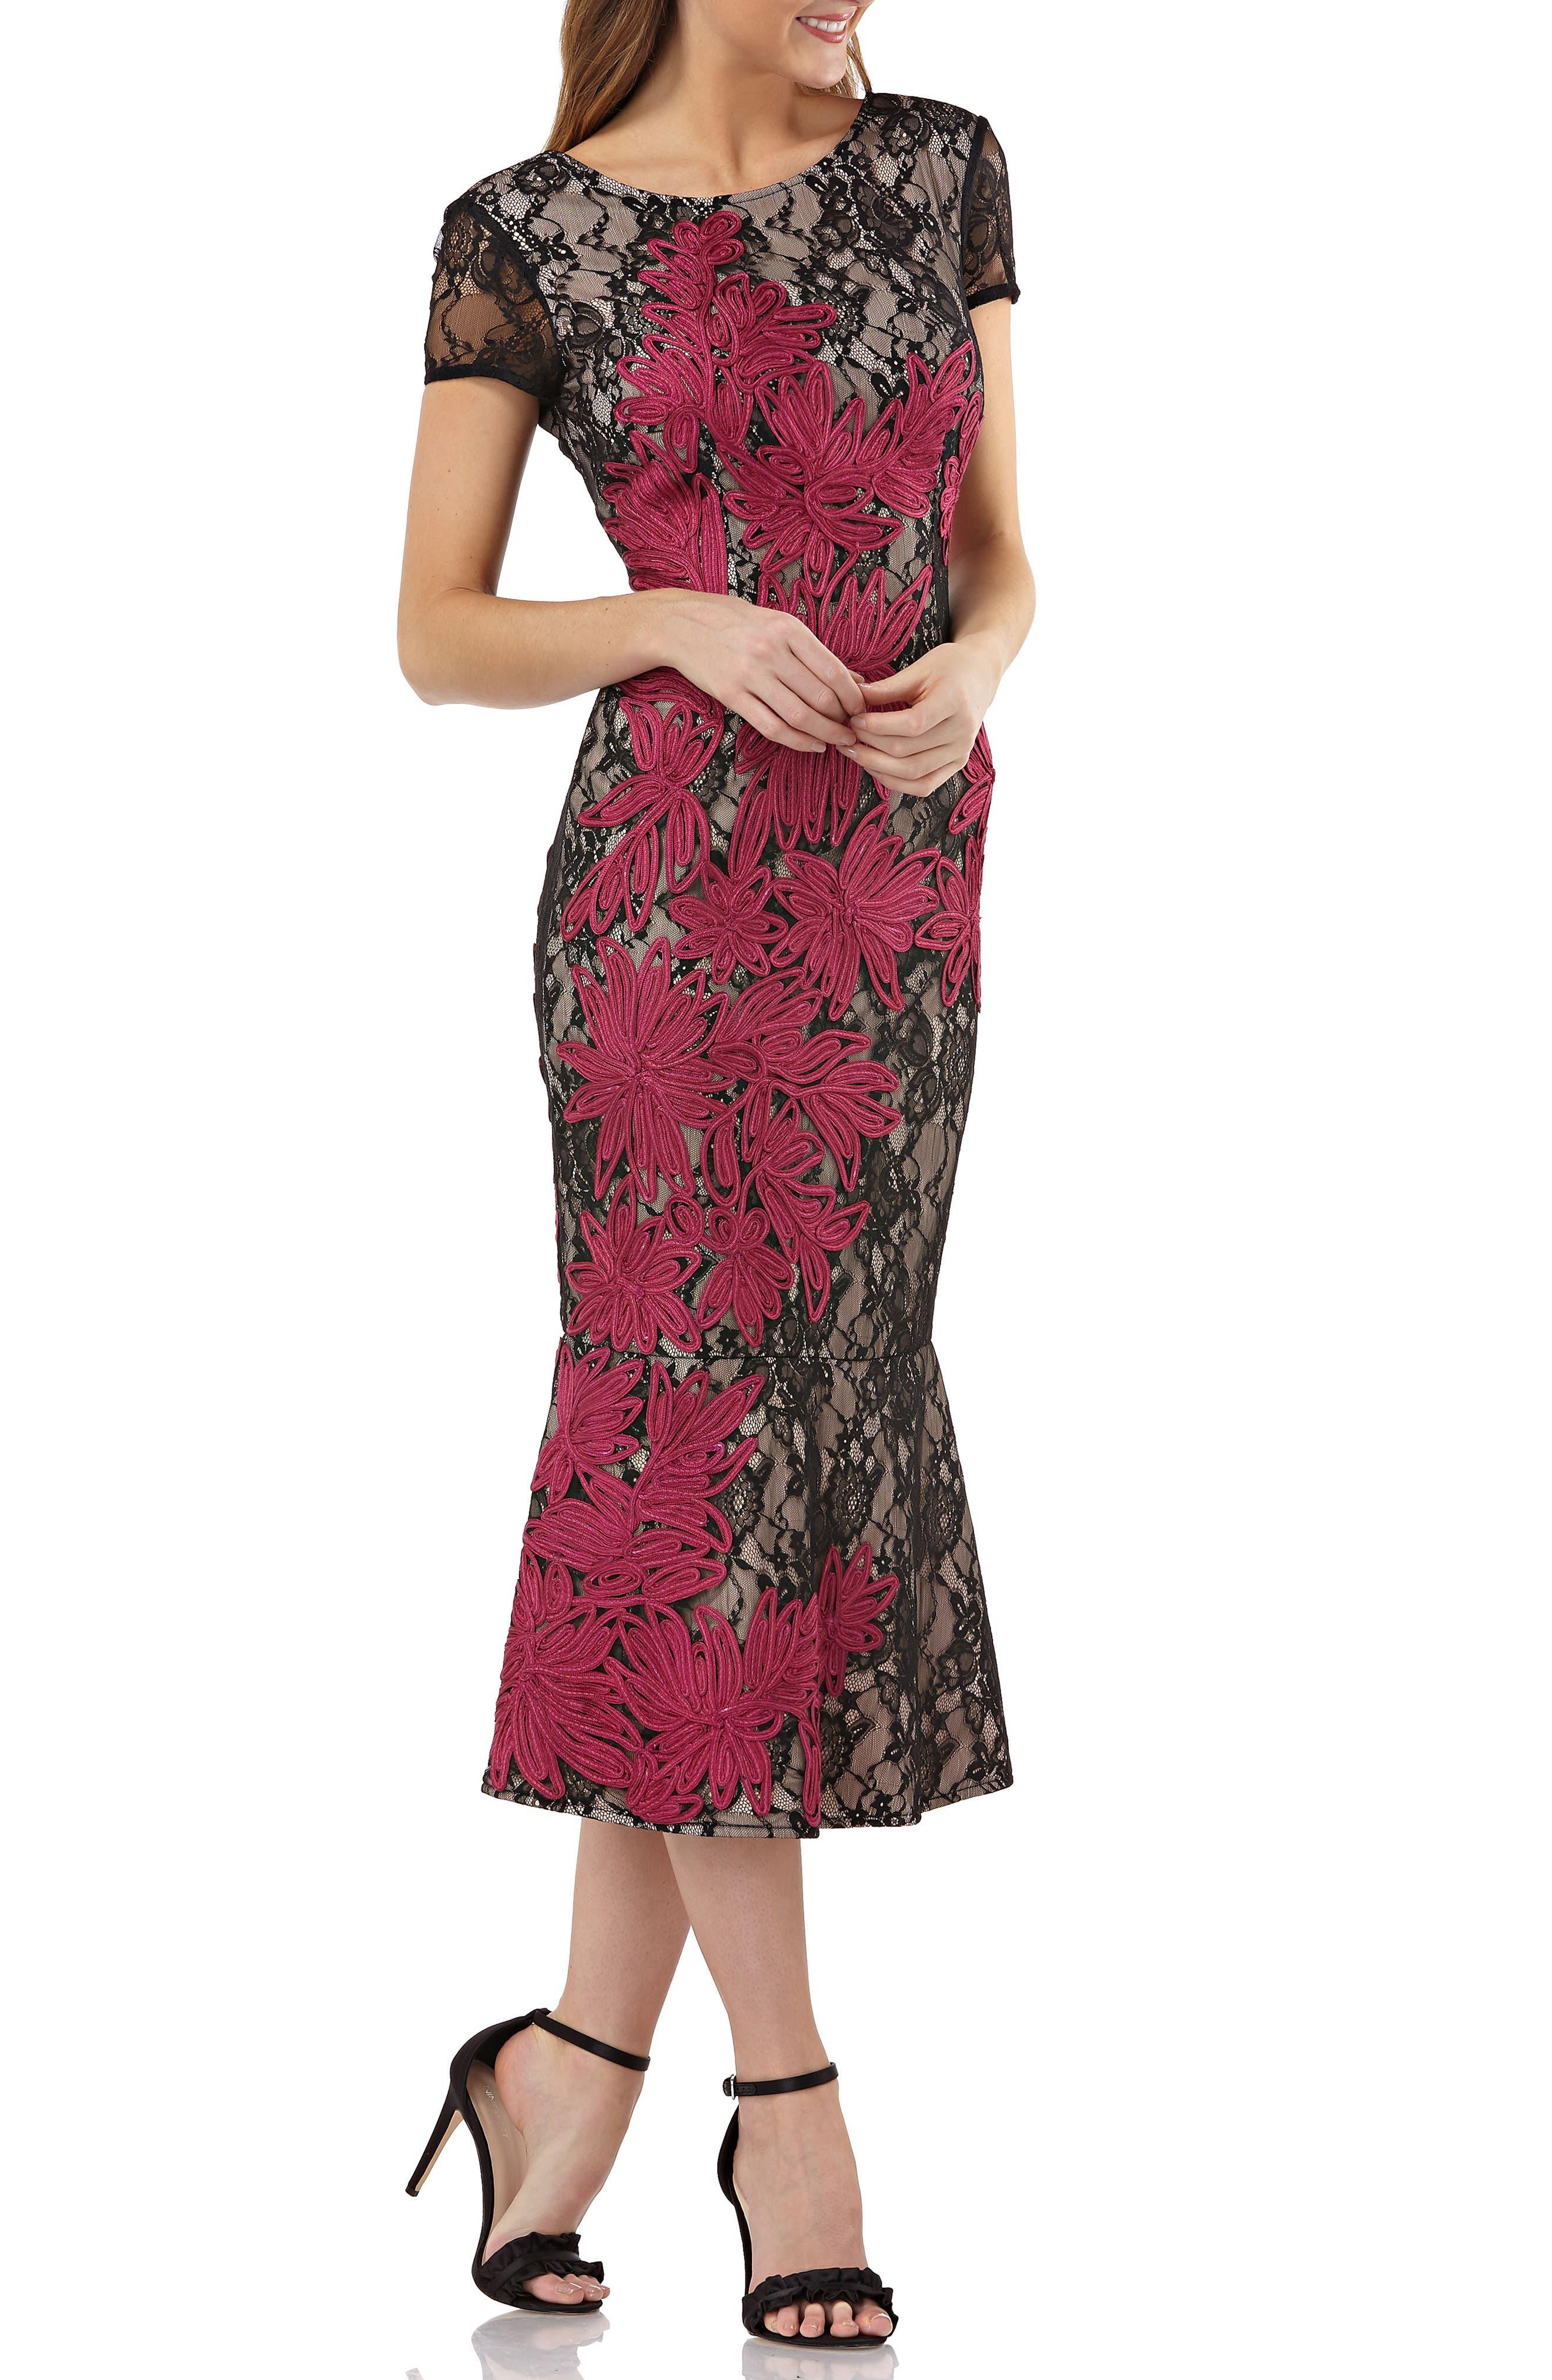 JS COLLECTIONS Soutache Embroidered Lace Dress, Main, color, BLACK/ MAGENTA